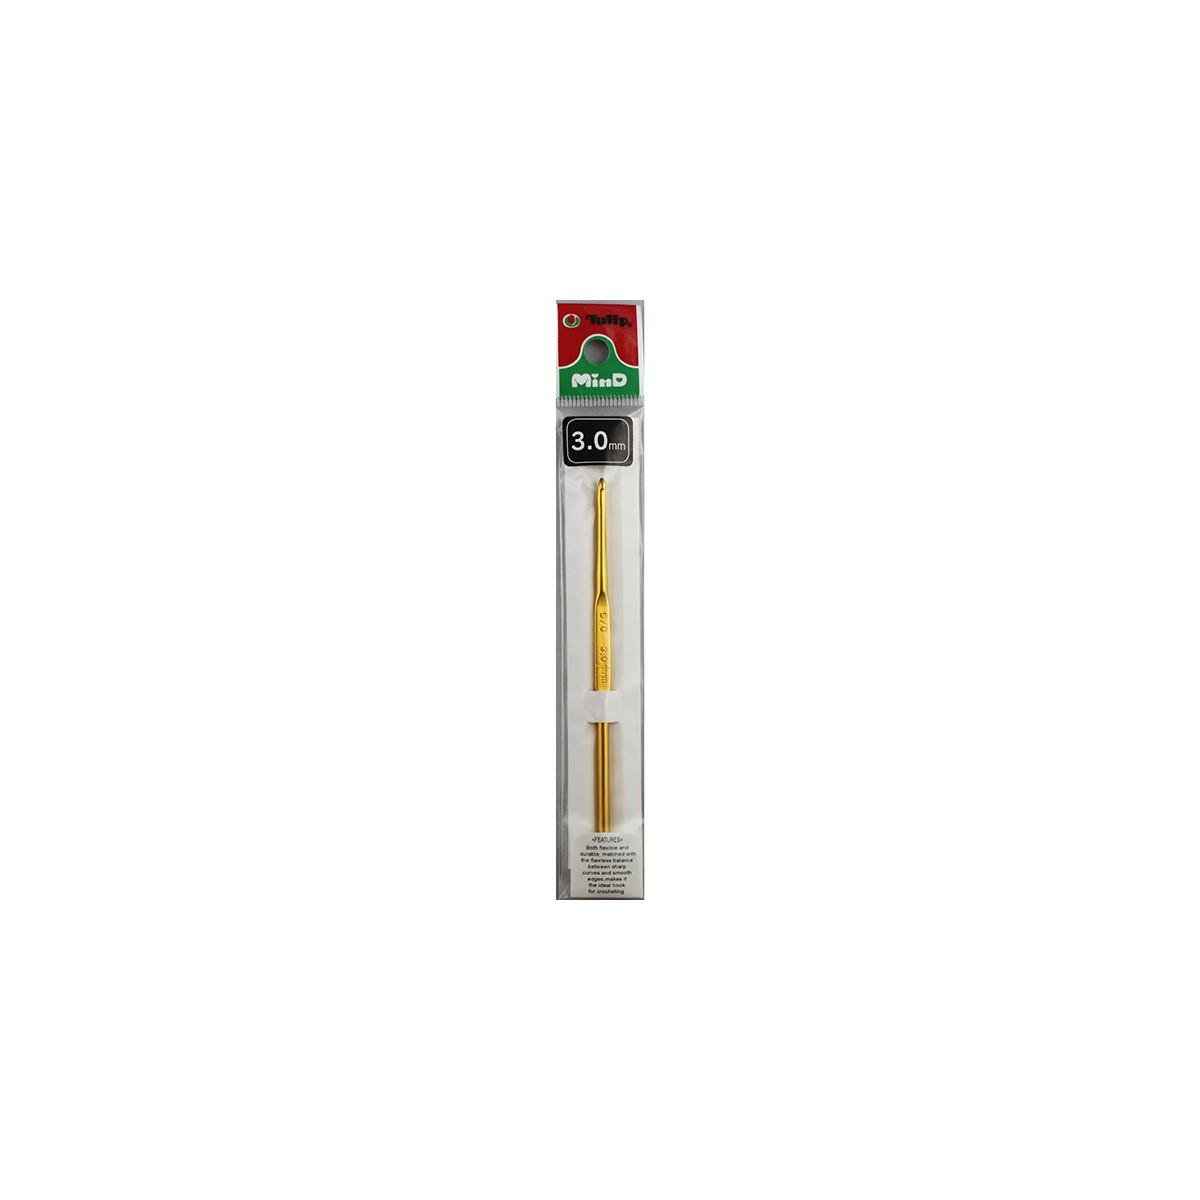 Uncinetto Tulip 3,00mm - 5/0